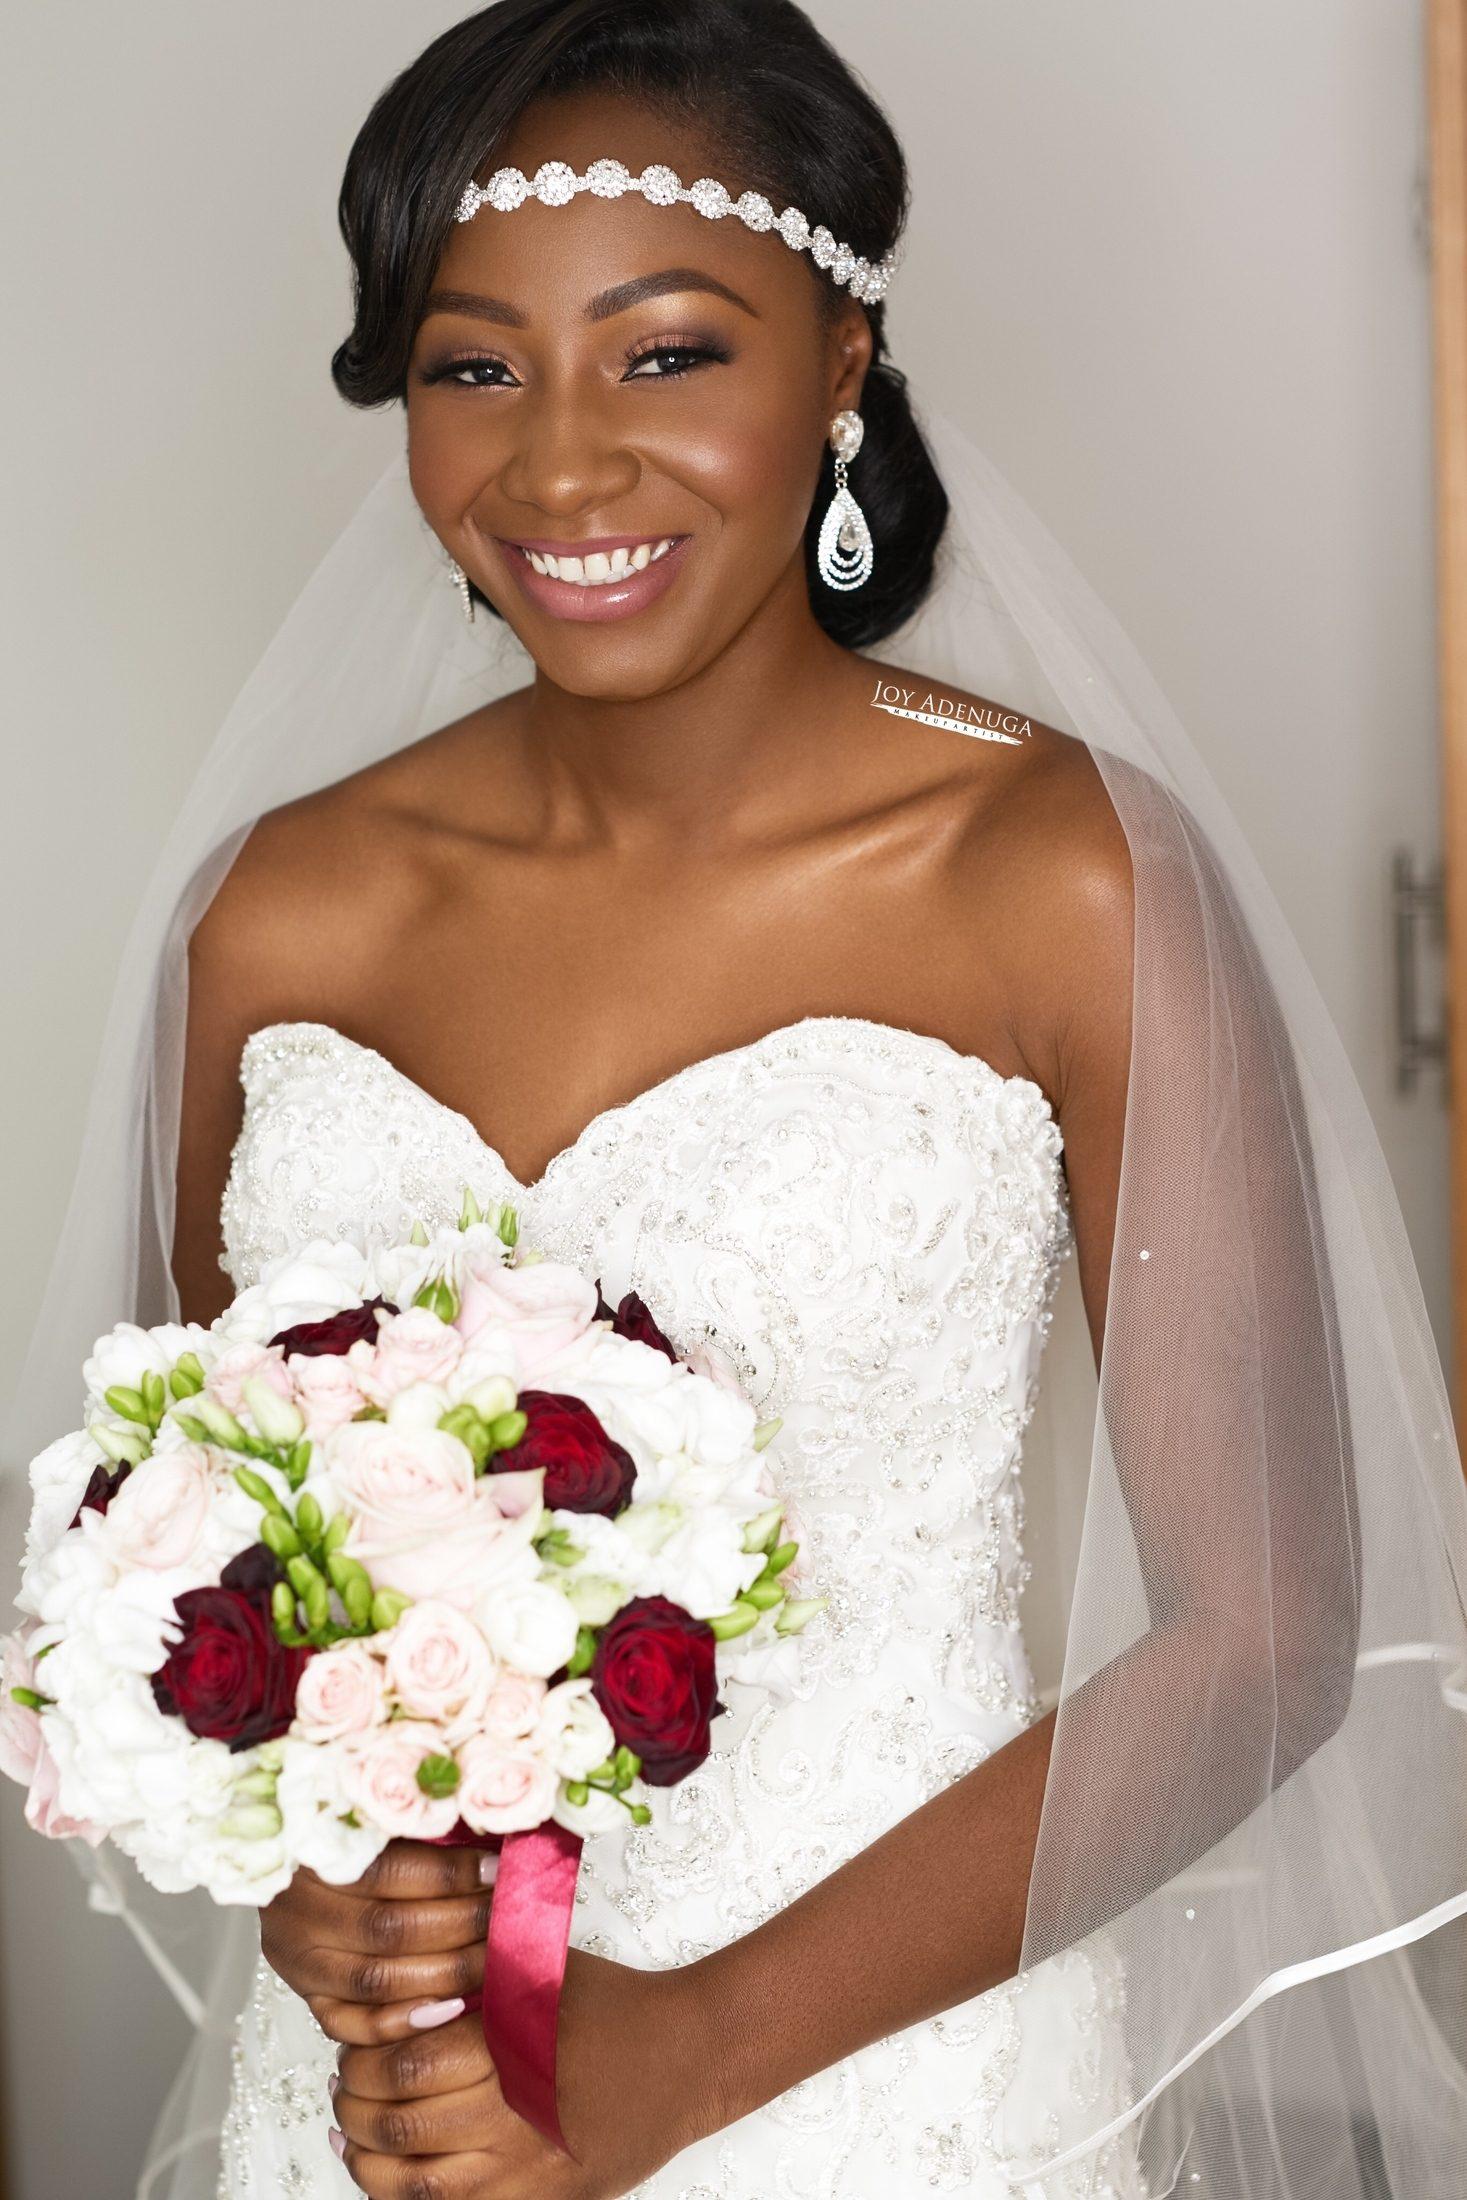 Bettina's Wedding, Joy Adenuga, Nigerian makeup artist London, Black brides, Black bride, black bridal blog london, Ghanaian bride, london black makeup artist, london makeup artist for black skin, black bridal makeup artist london, makeup artist for black skin, Nigerian makeup artist london, makeup artist for women of colour